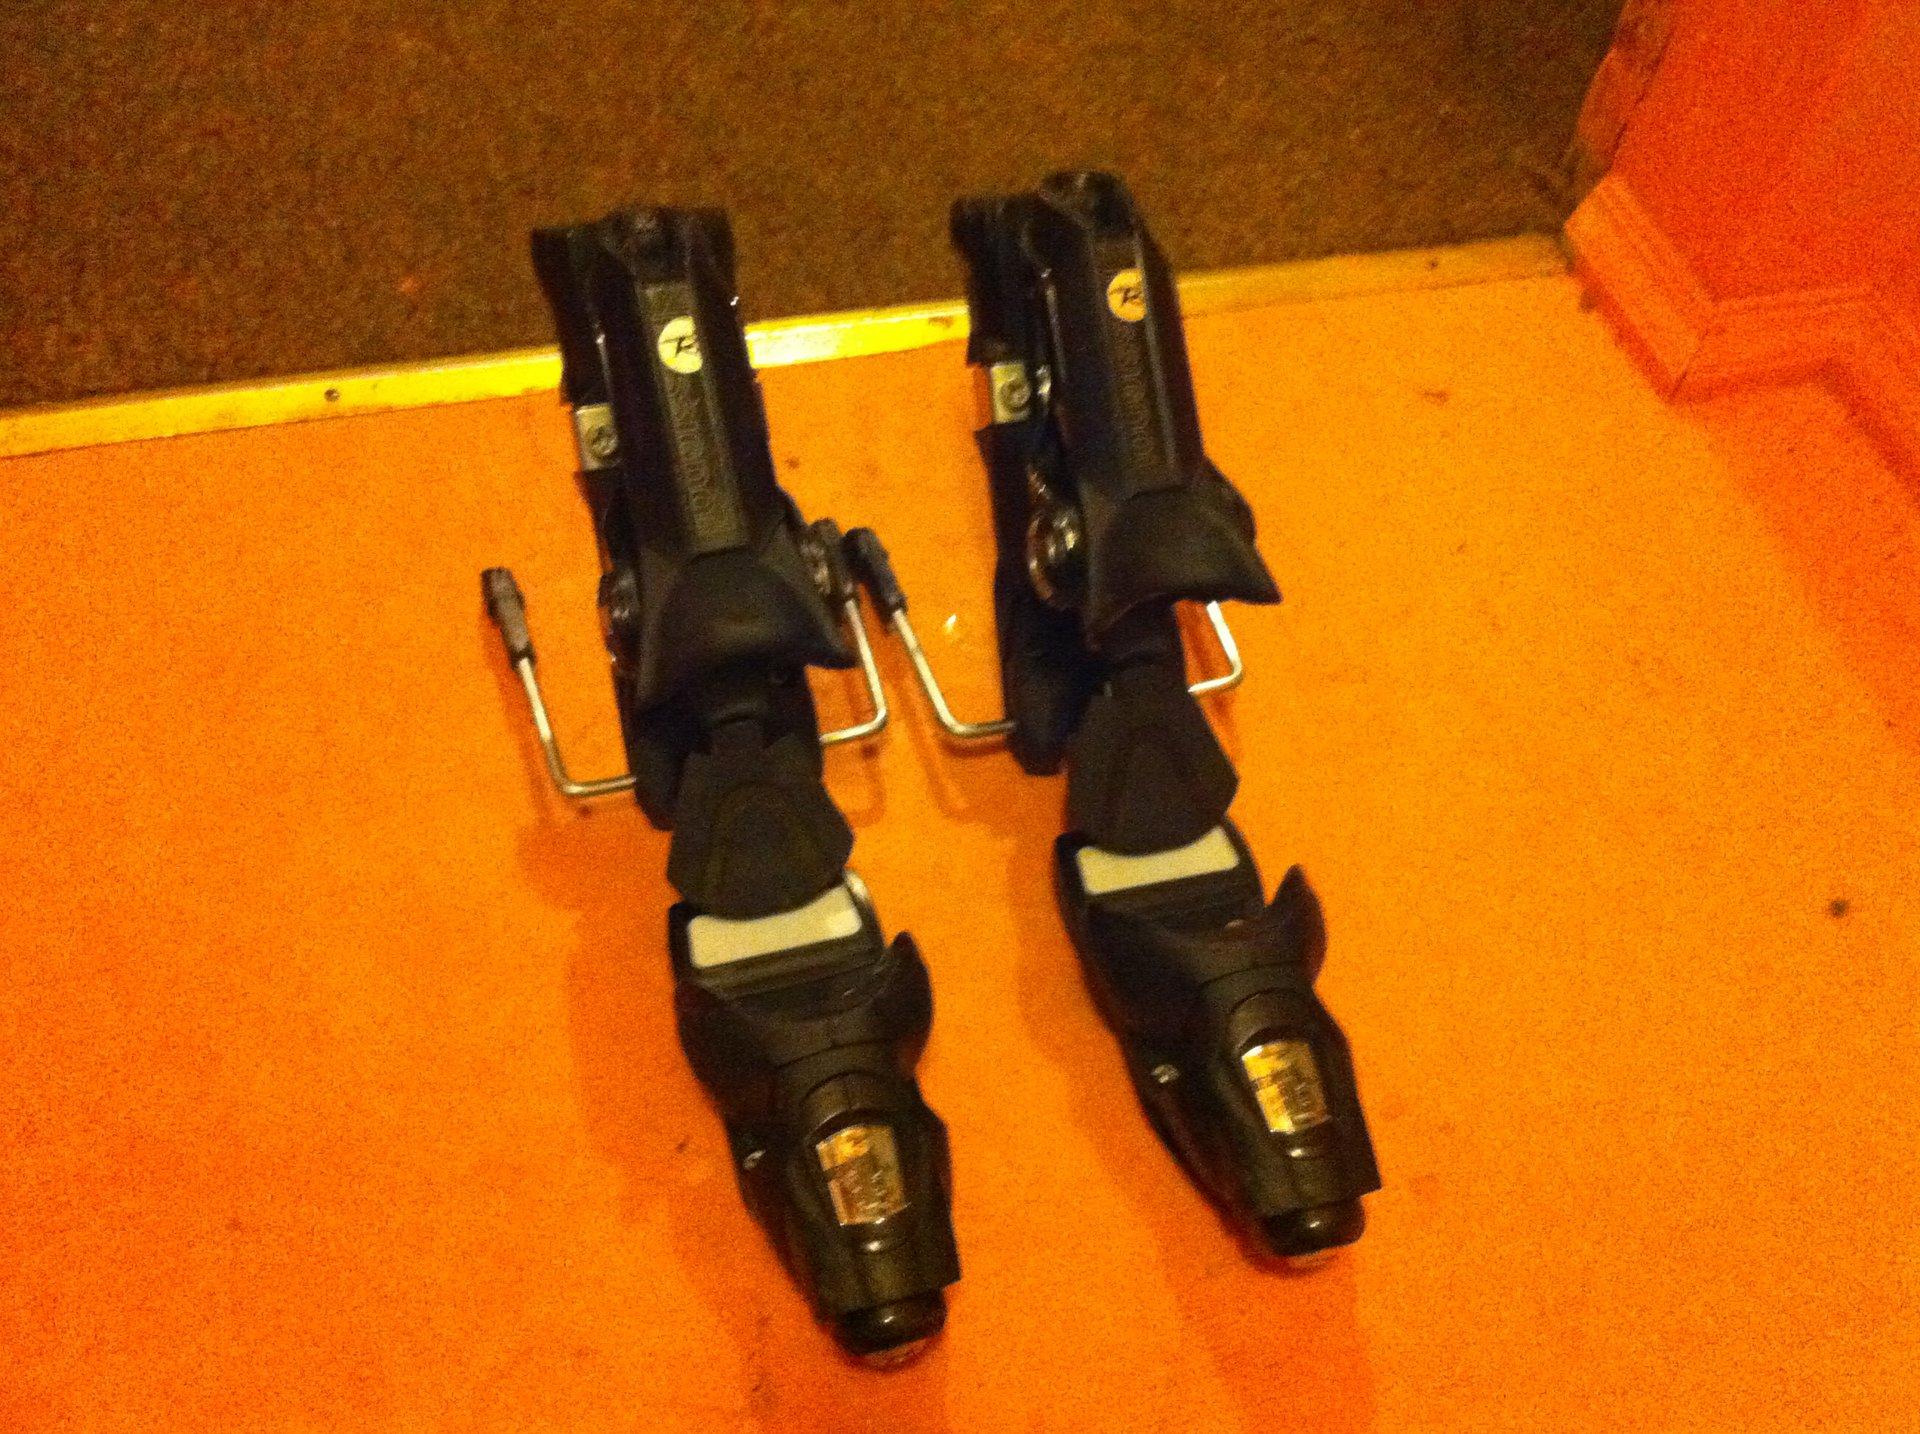 Ski gear - 12 of 12